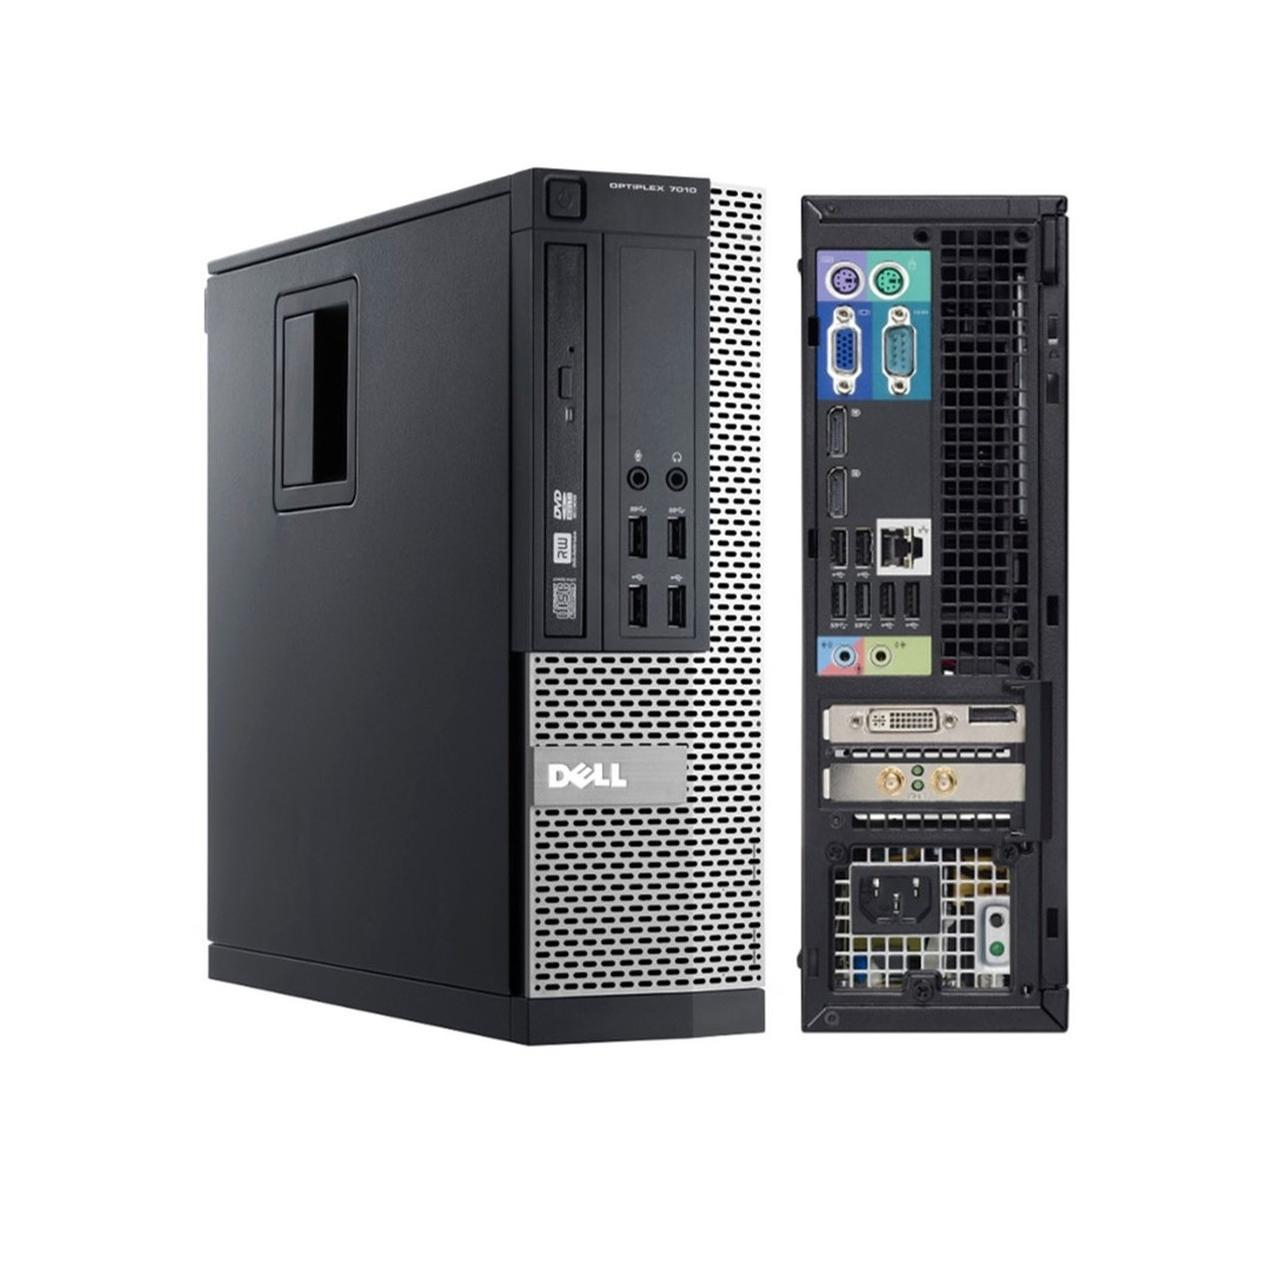 Dell OptiPlex 7010 SFF Core i5-3470 3.2 - HDD 500 GB - 4GB